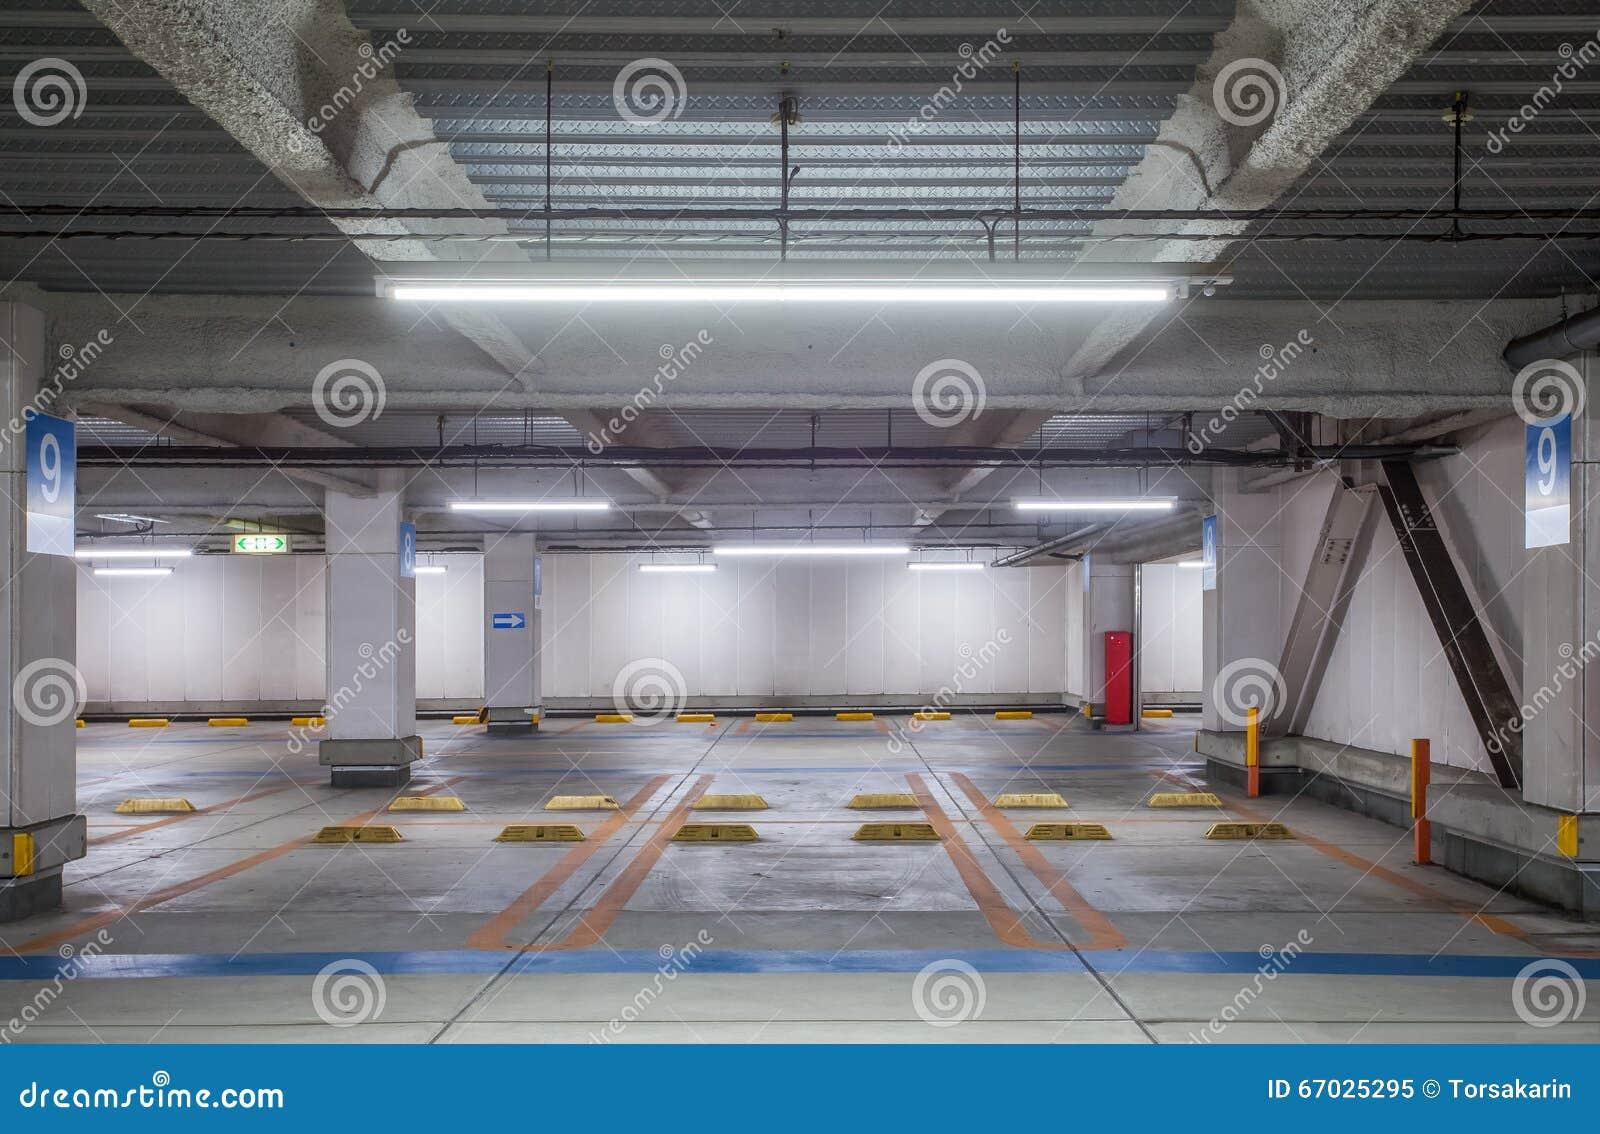 empty space car park stock photo image 67025295. Black Bedroom Furniture Sets. Home Design Ideas